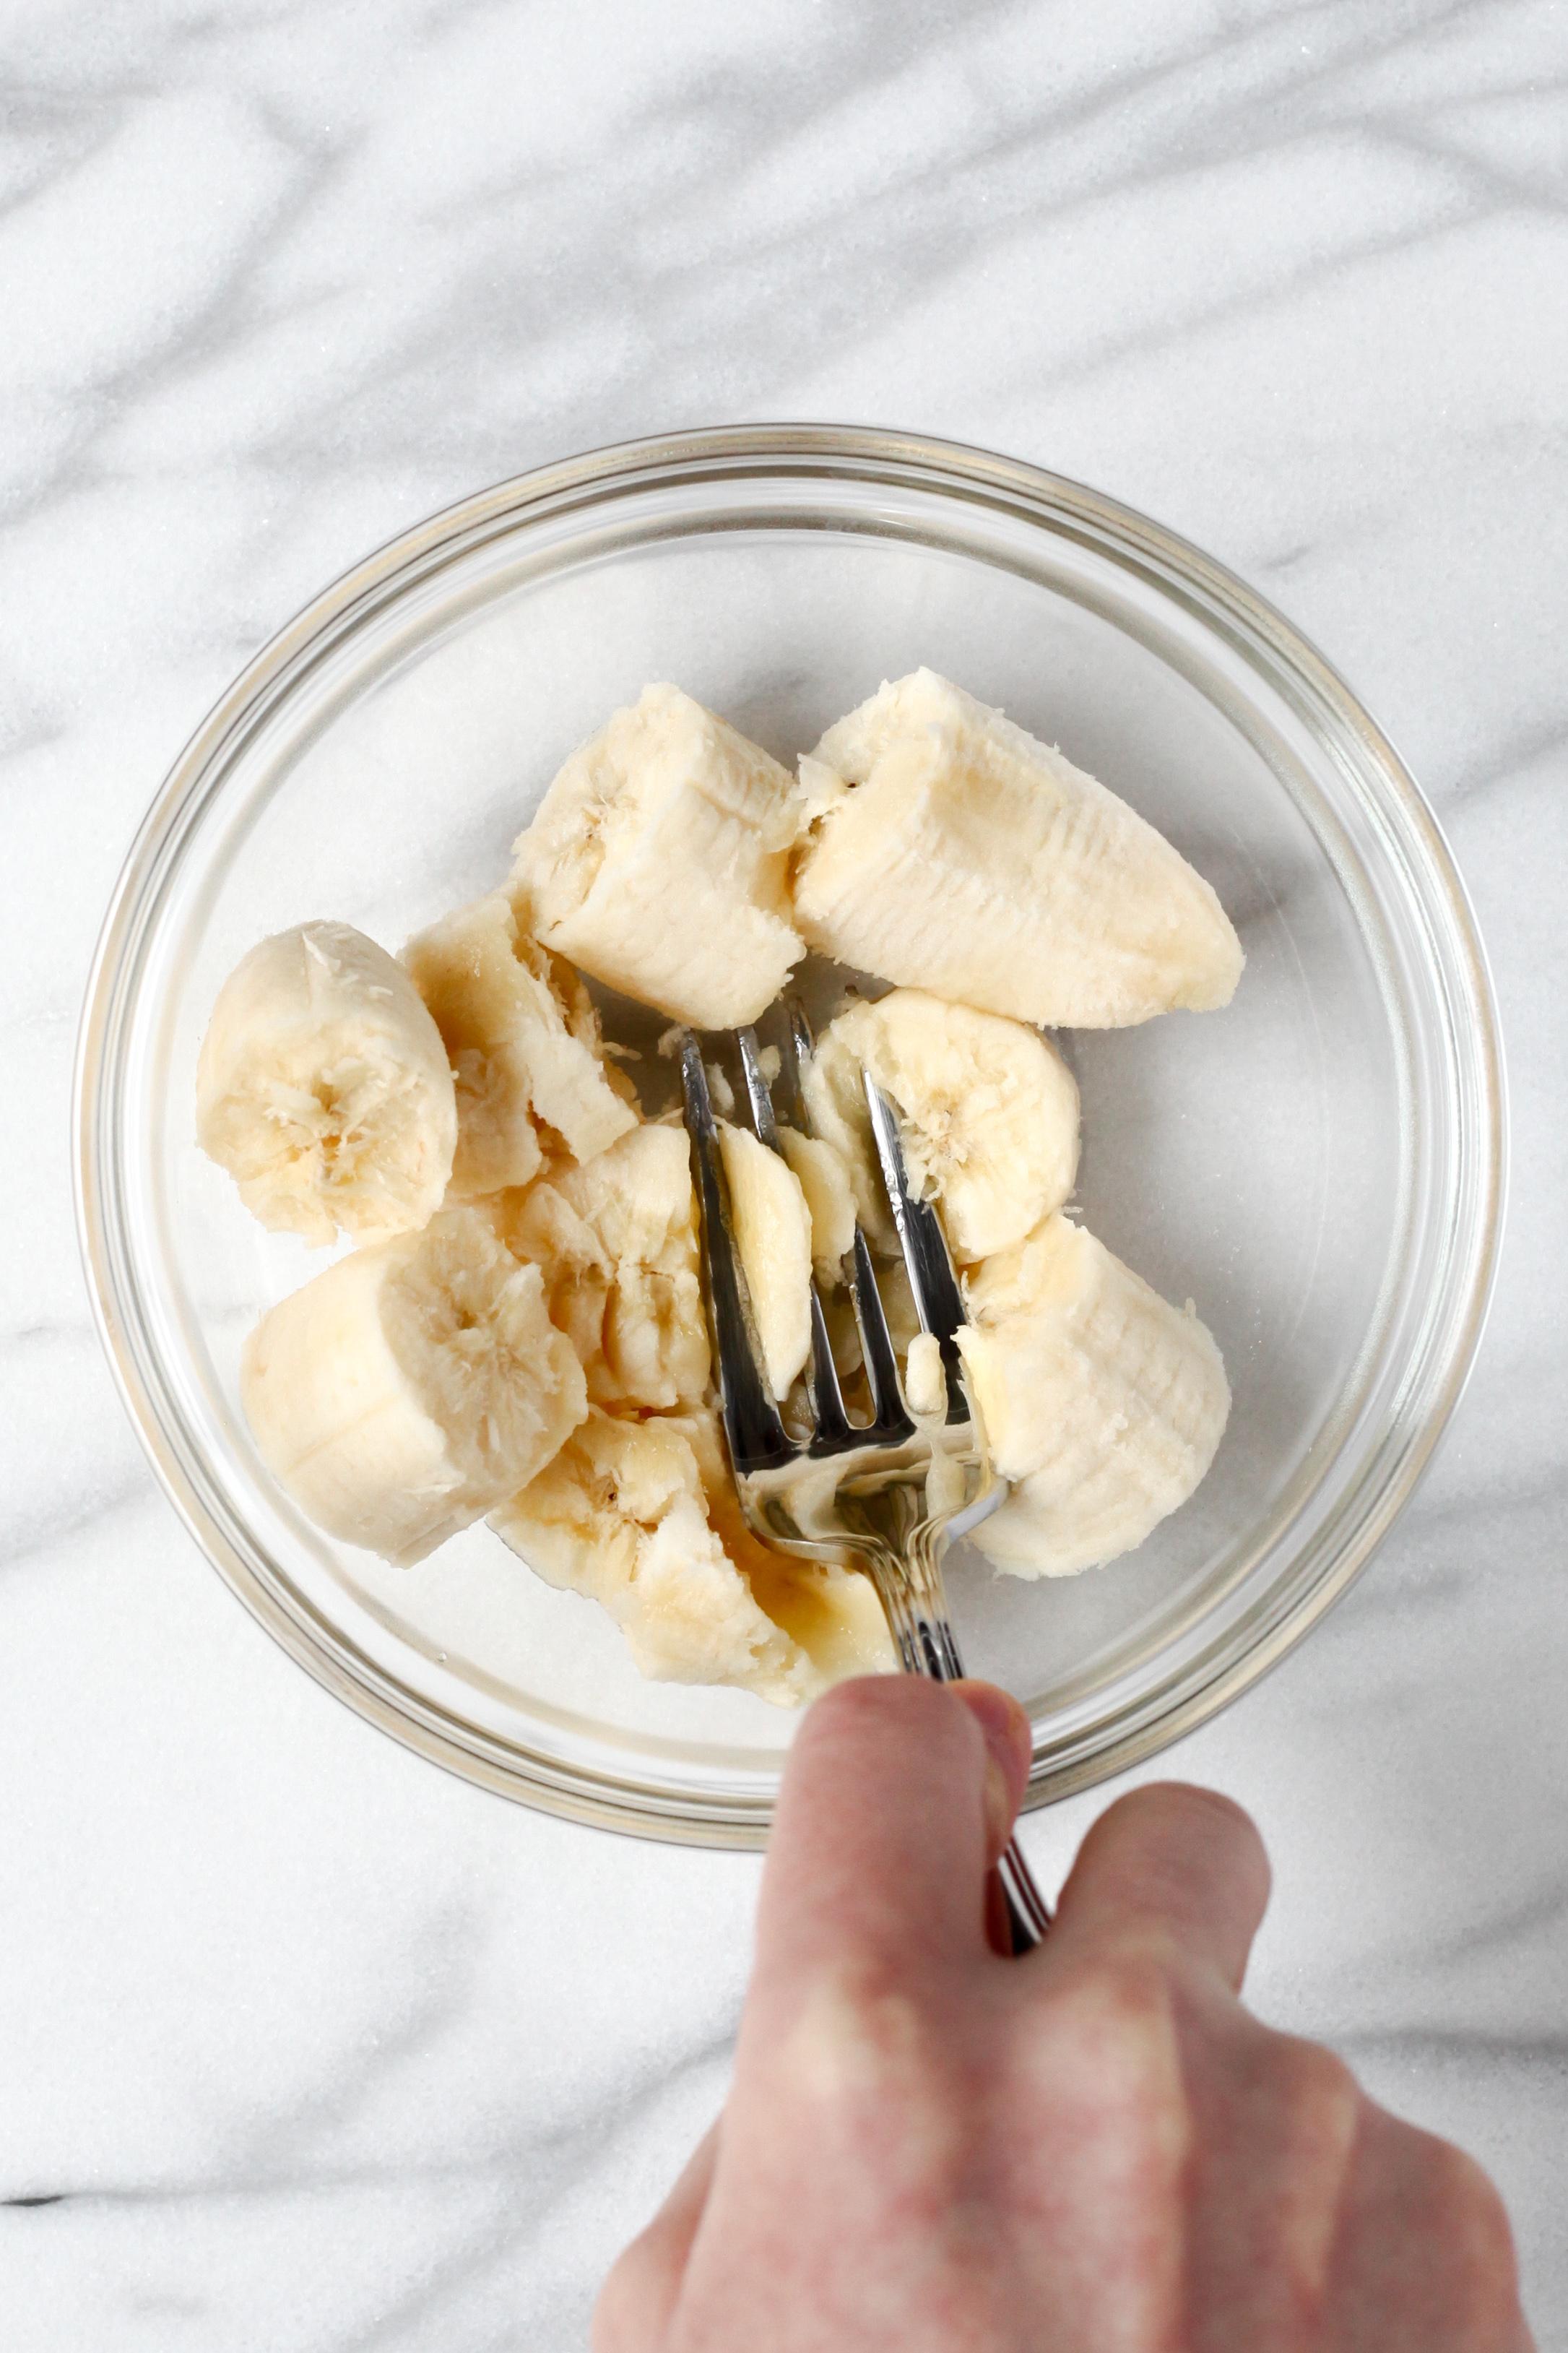 Mashing banana